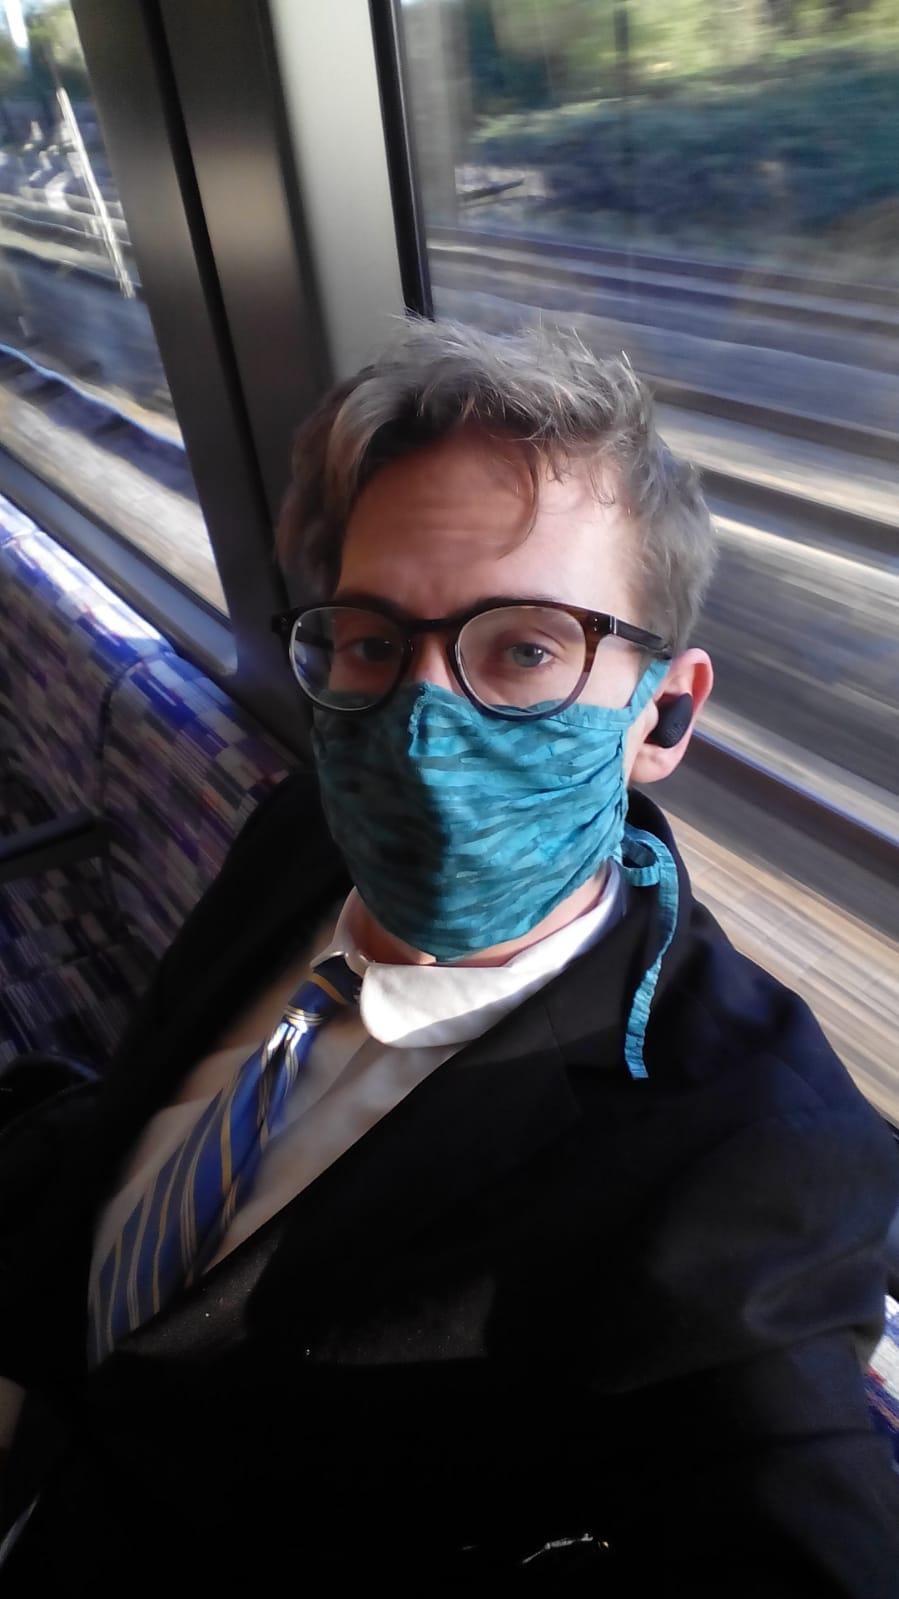 Jorik on his way to a job interview